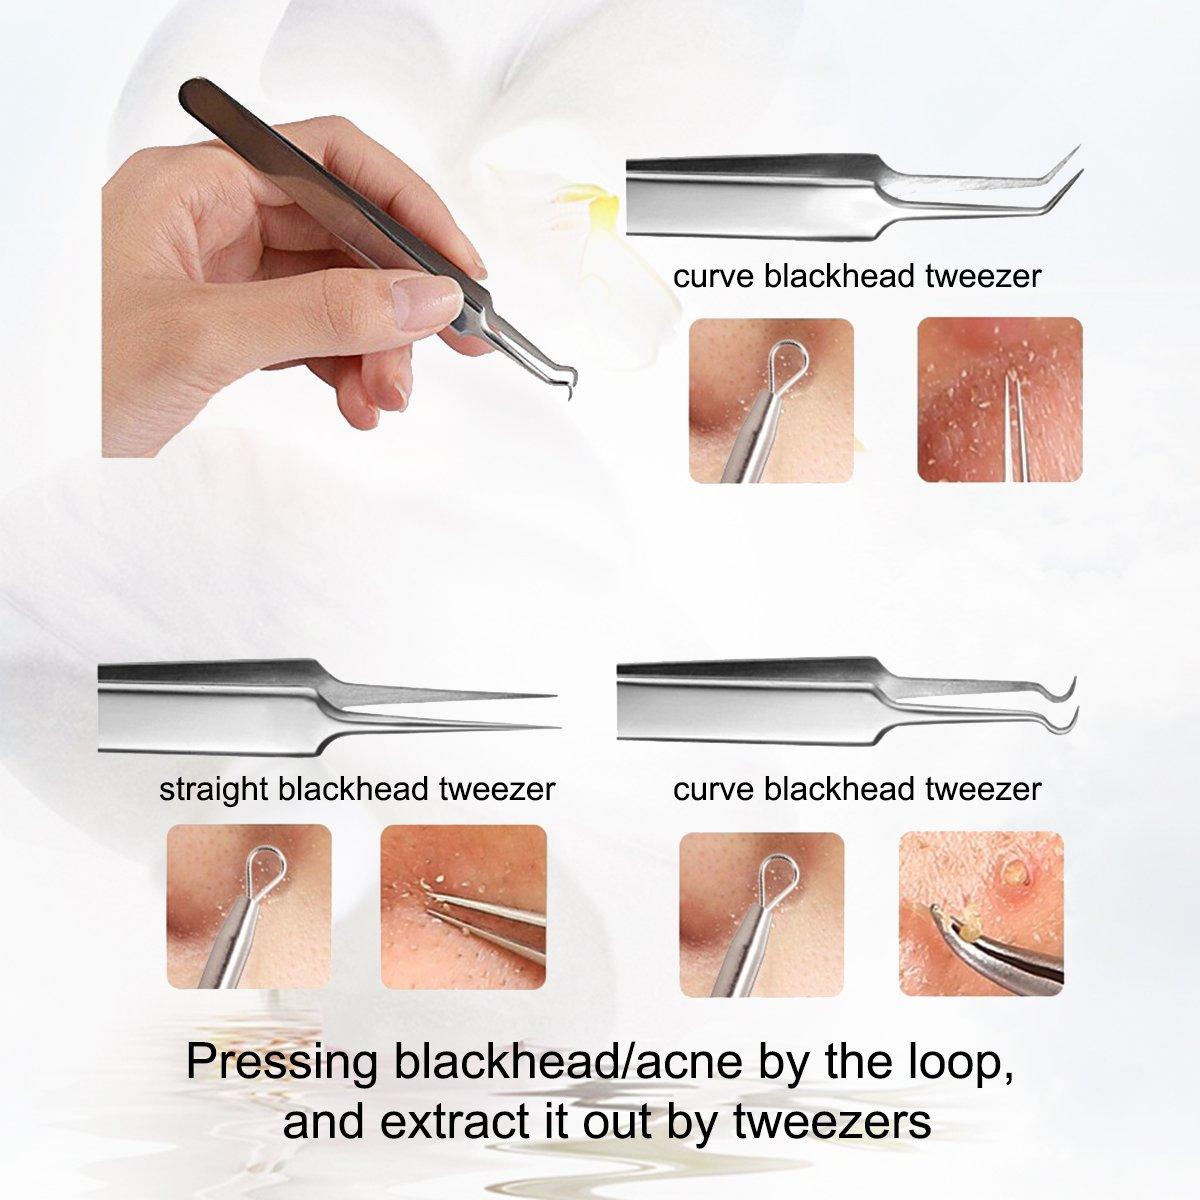 AMTOK Blackhead Remover Kit Curved Blackhead Tweezers Kit Pimple Comedone Extractor Tool Set Treatment for Blemish , Zit Popper (Tweezers Kit 5pcs)